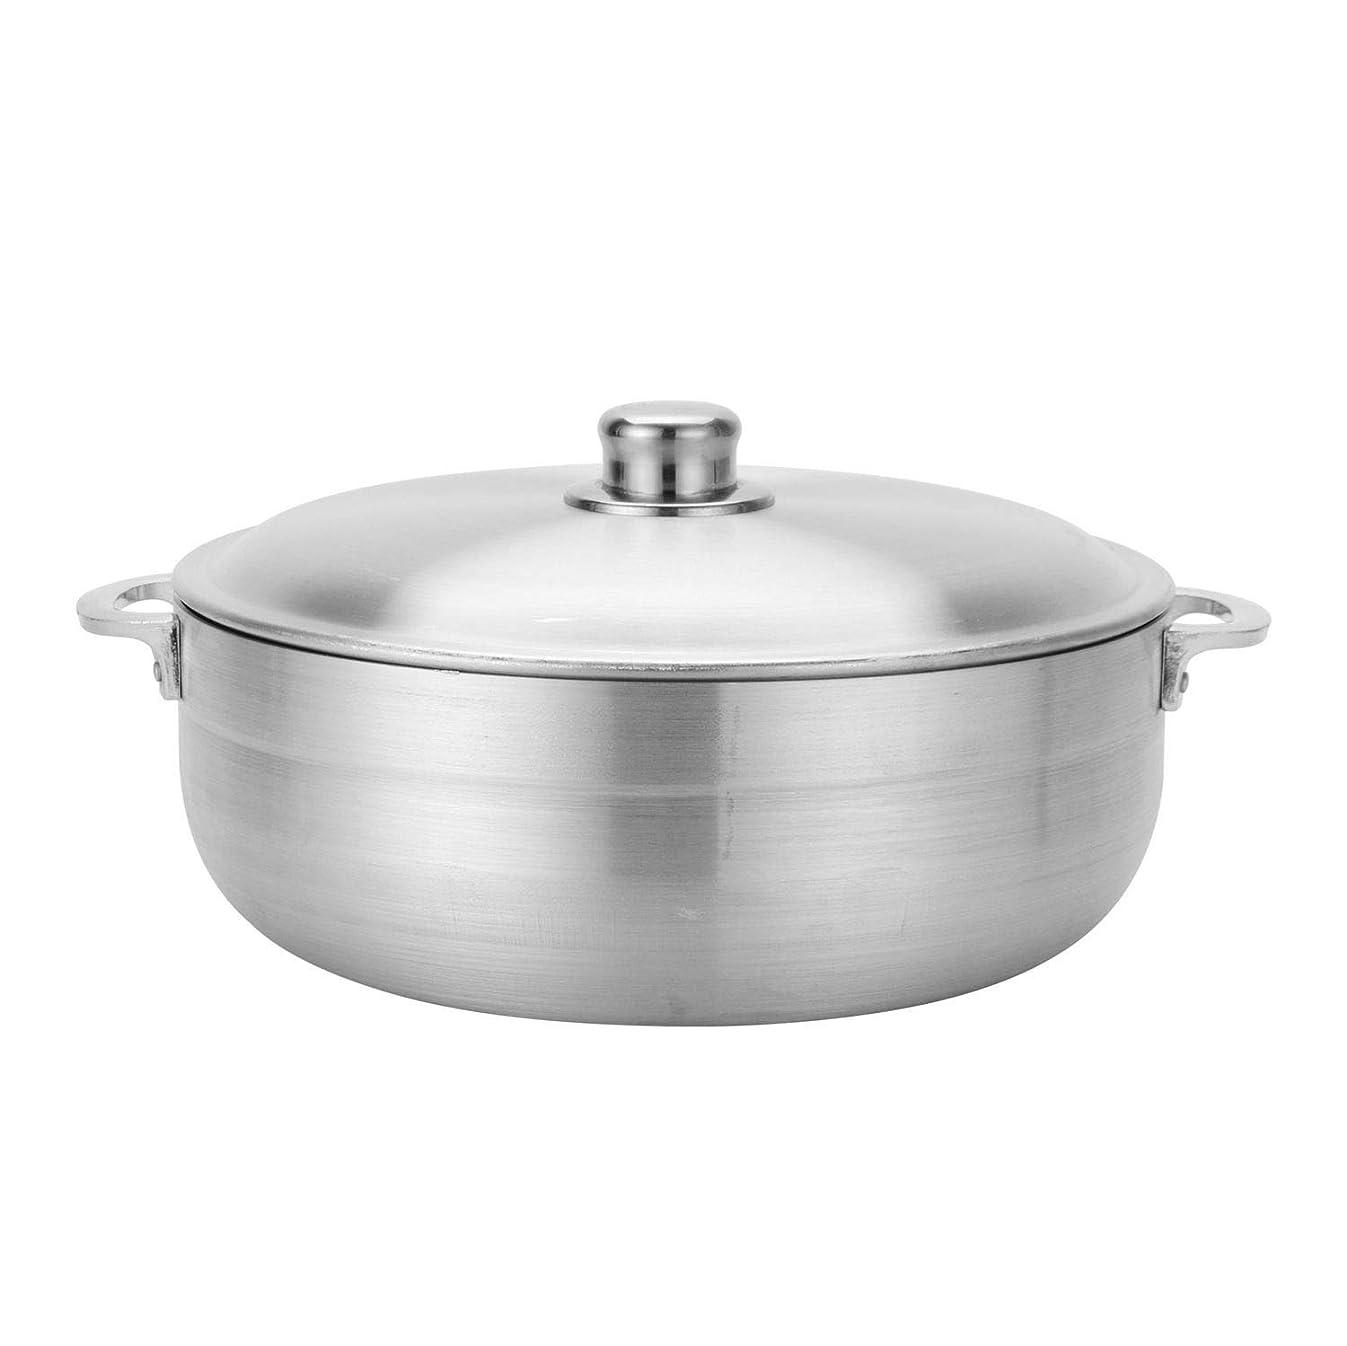 Aramco AI-6928-13 Alpine Gourmet Caldero, 13-Quart, Silver